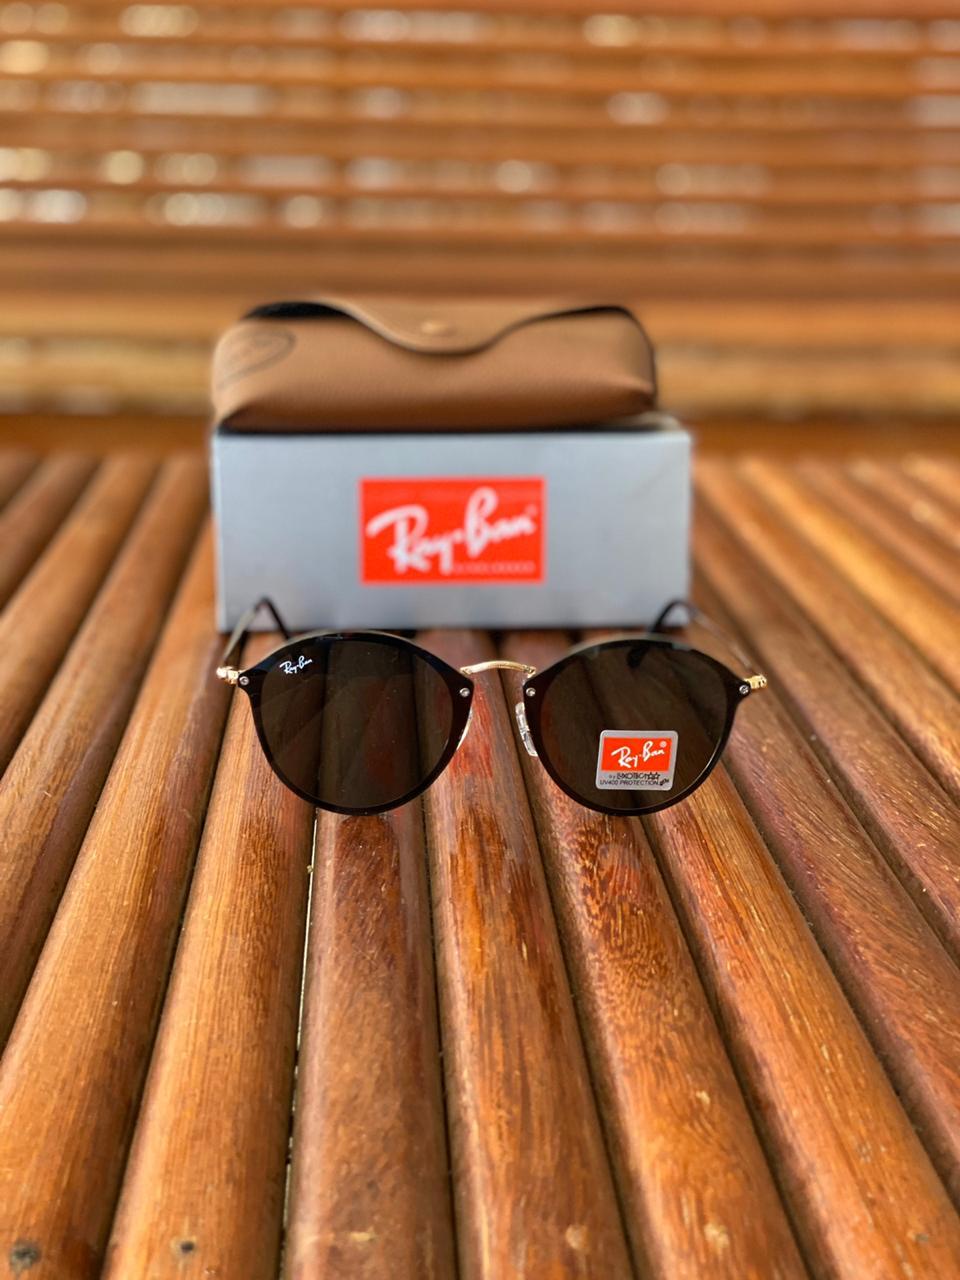 Oculos Masculino Ray Ban RB8 Termoplástico Liso - Preto